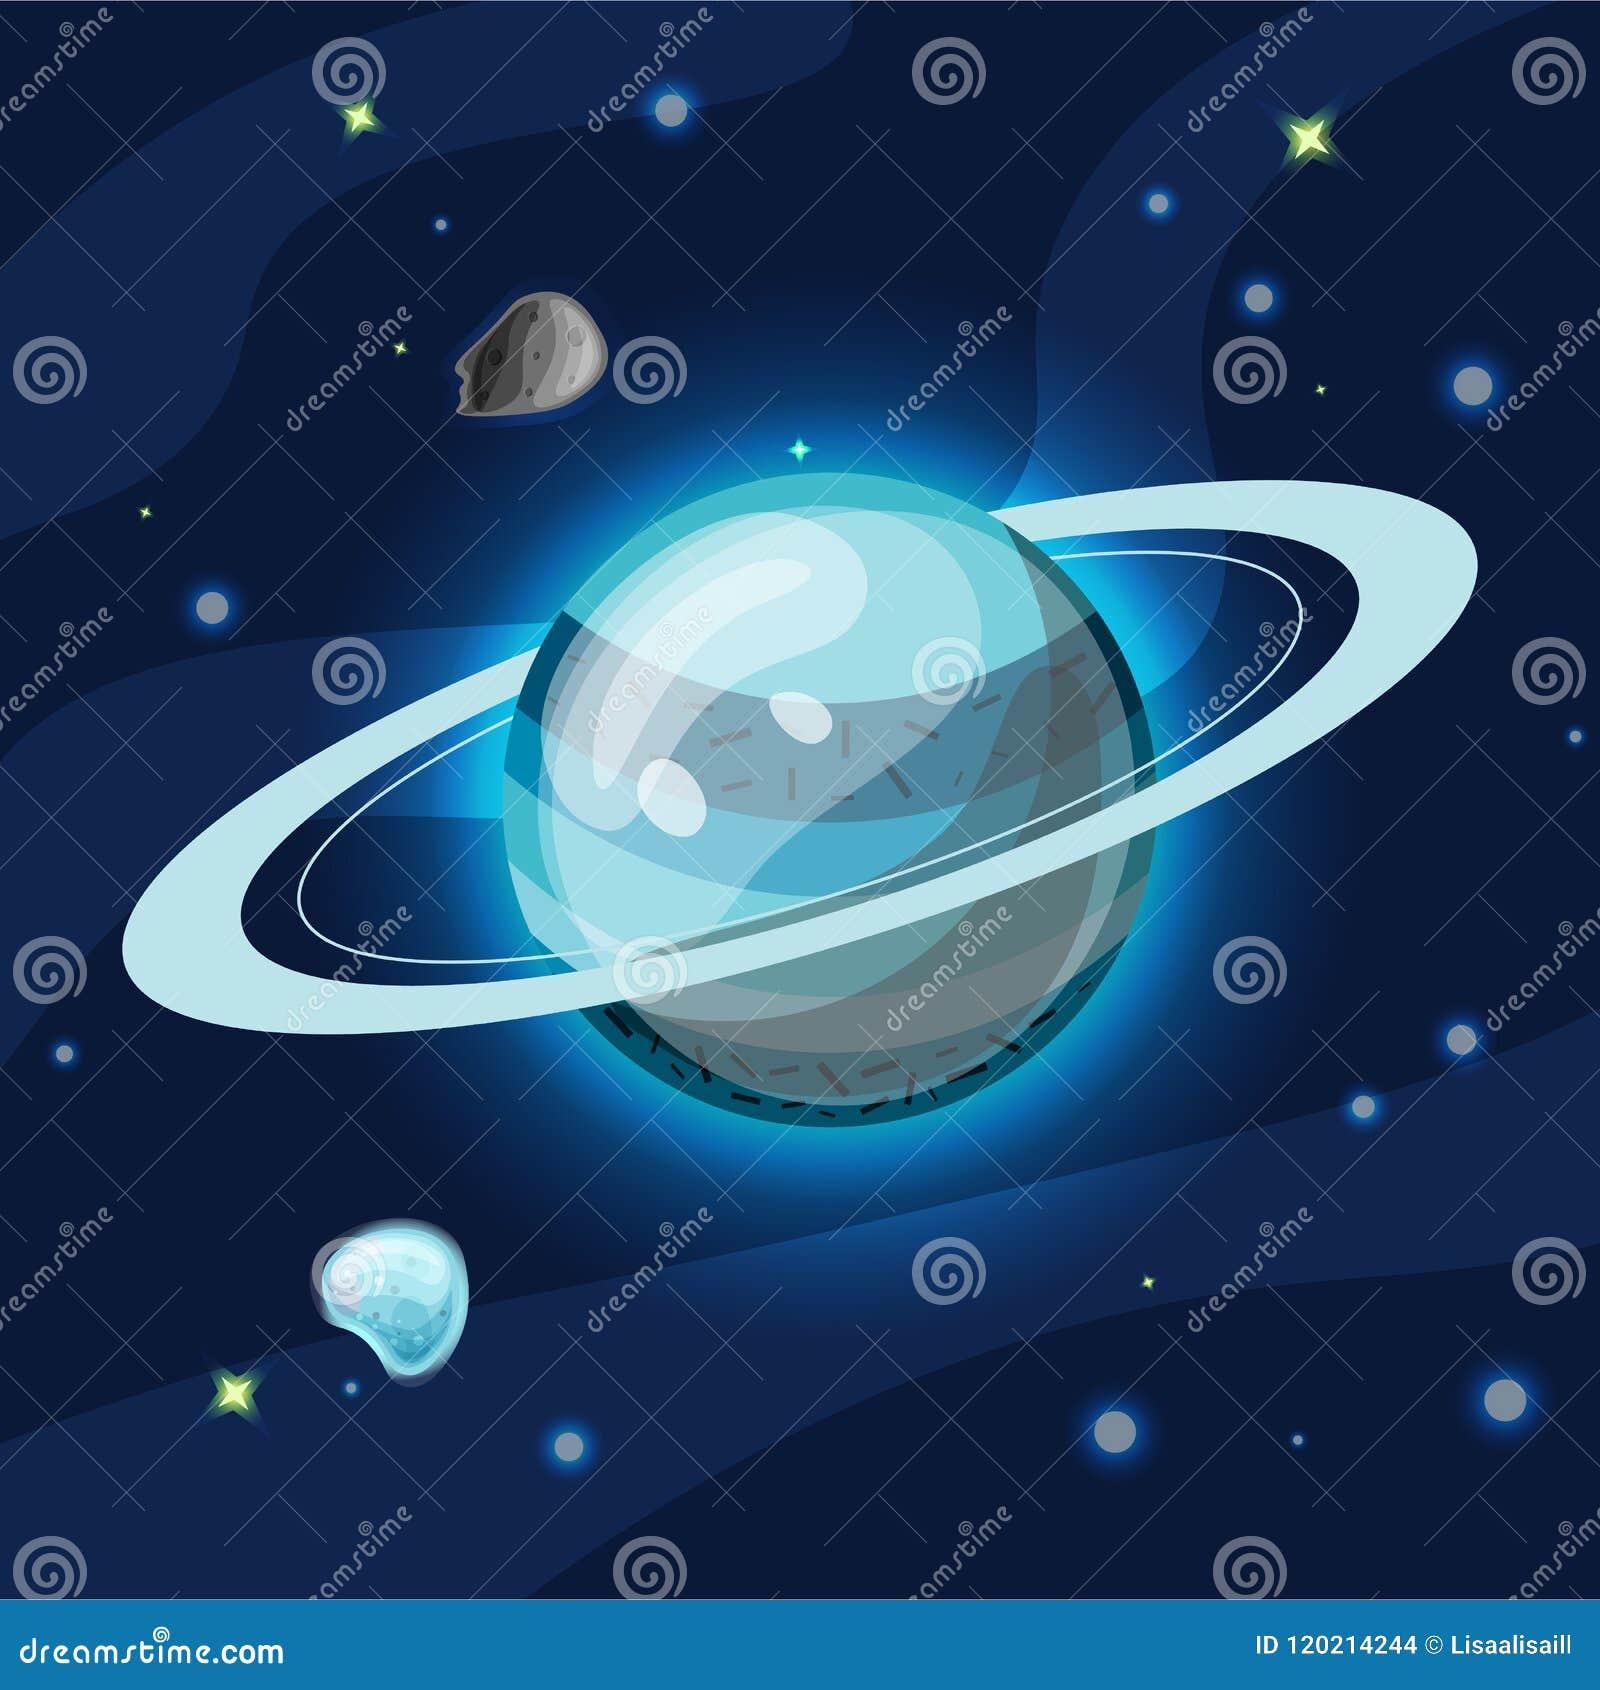 Uran,传染媒介动画片例证 太阳系蓝色Uran行星黑暗的深刻的蓝色空间的,隔绝在蓝色背景